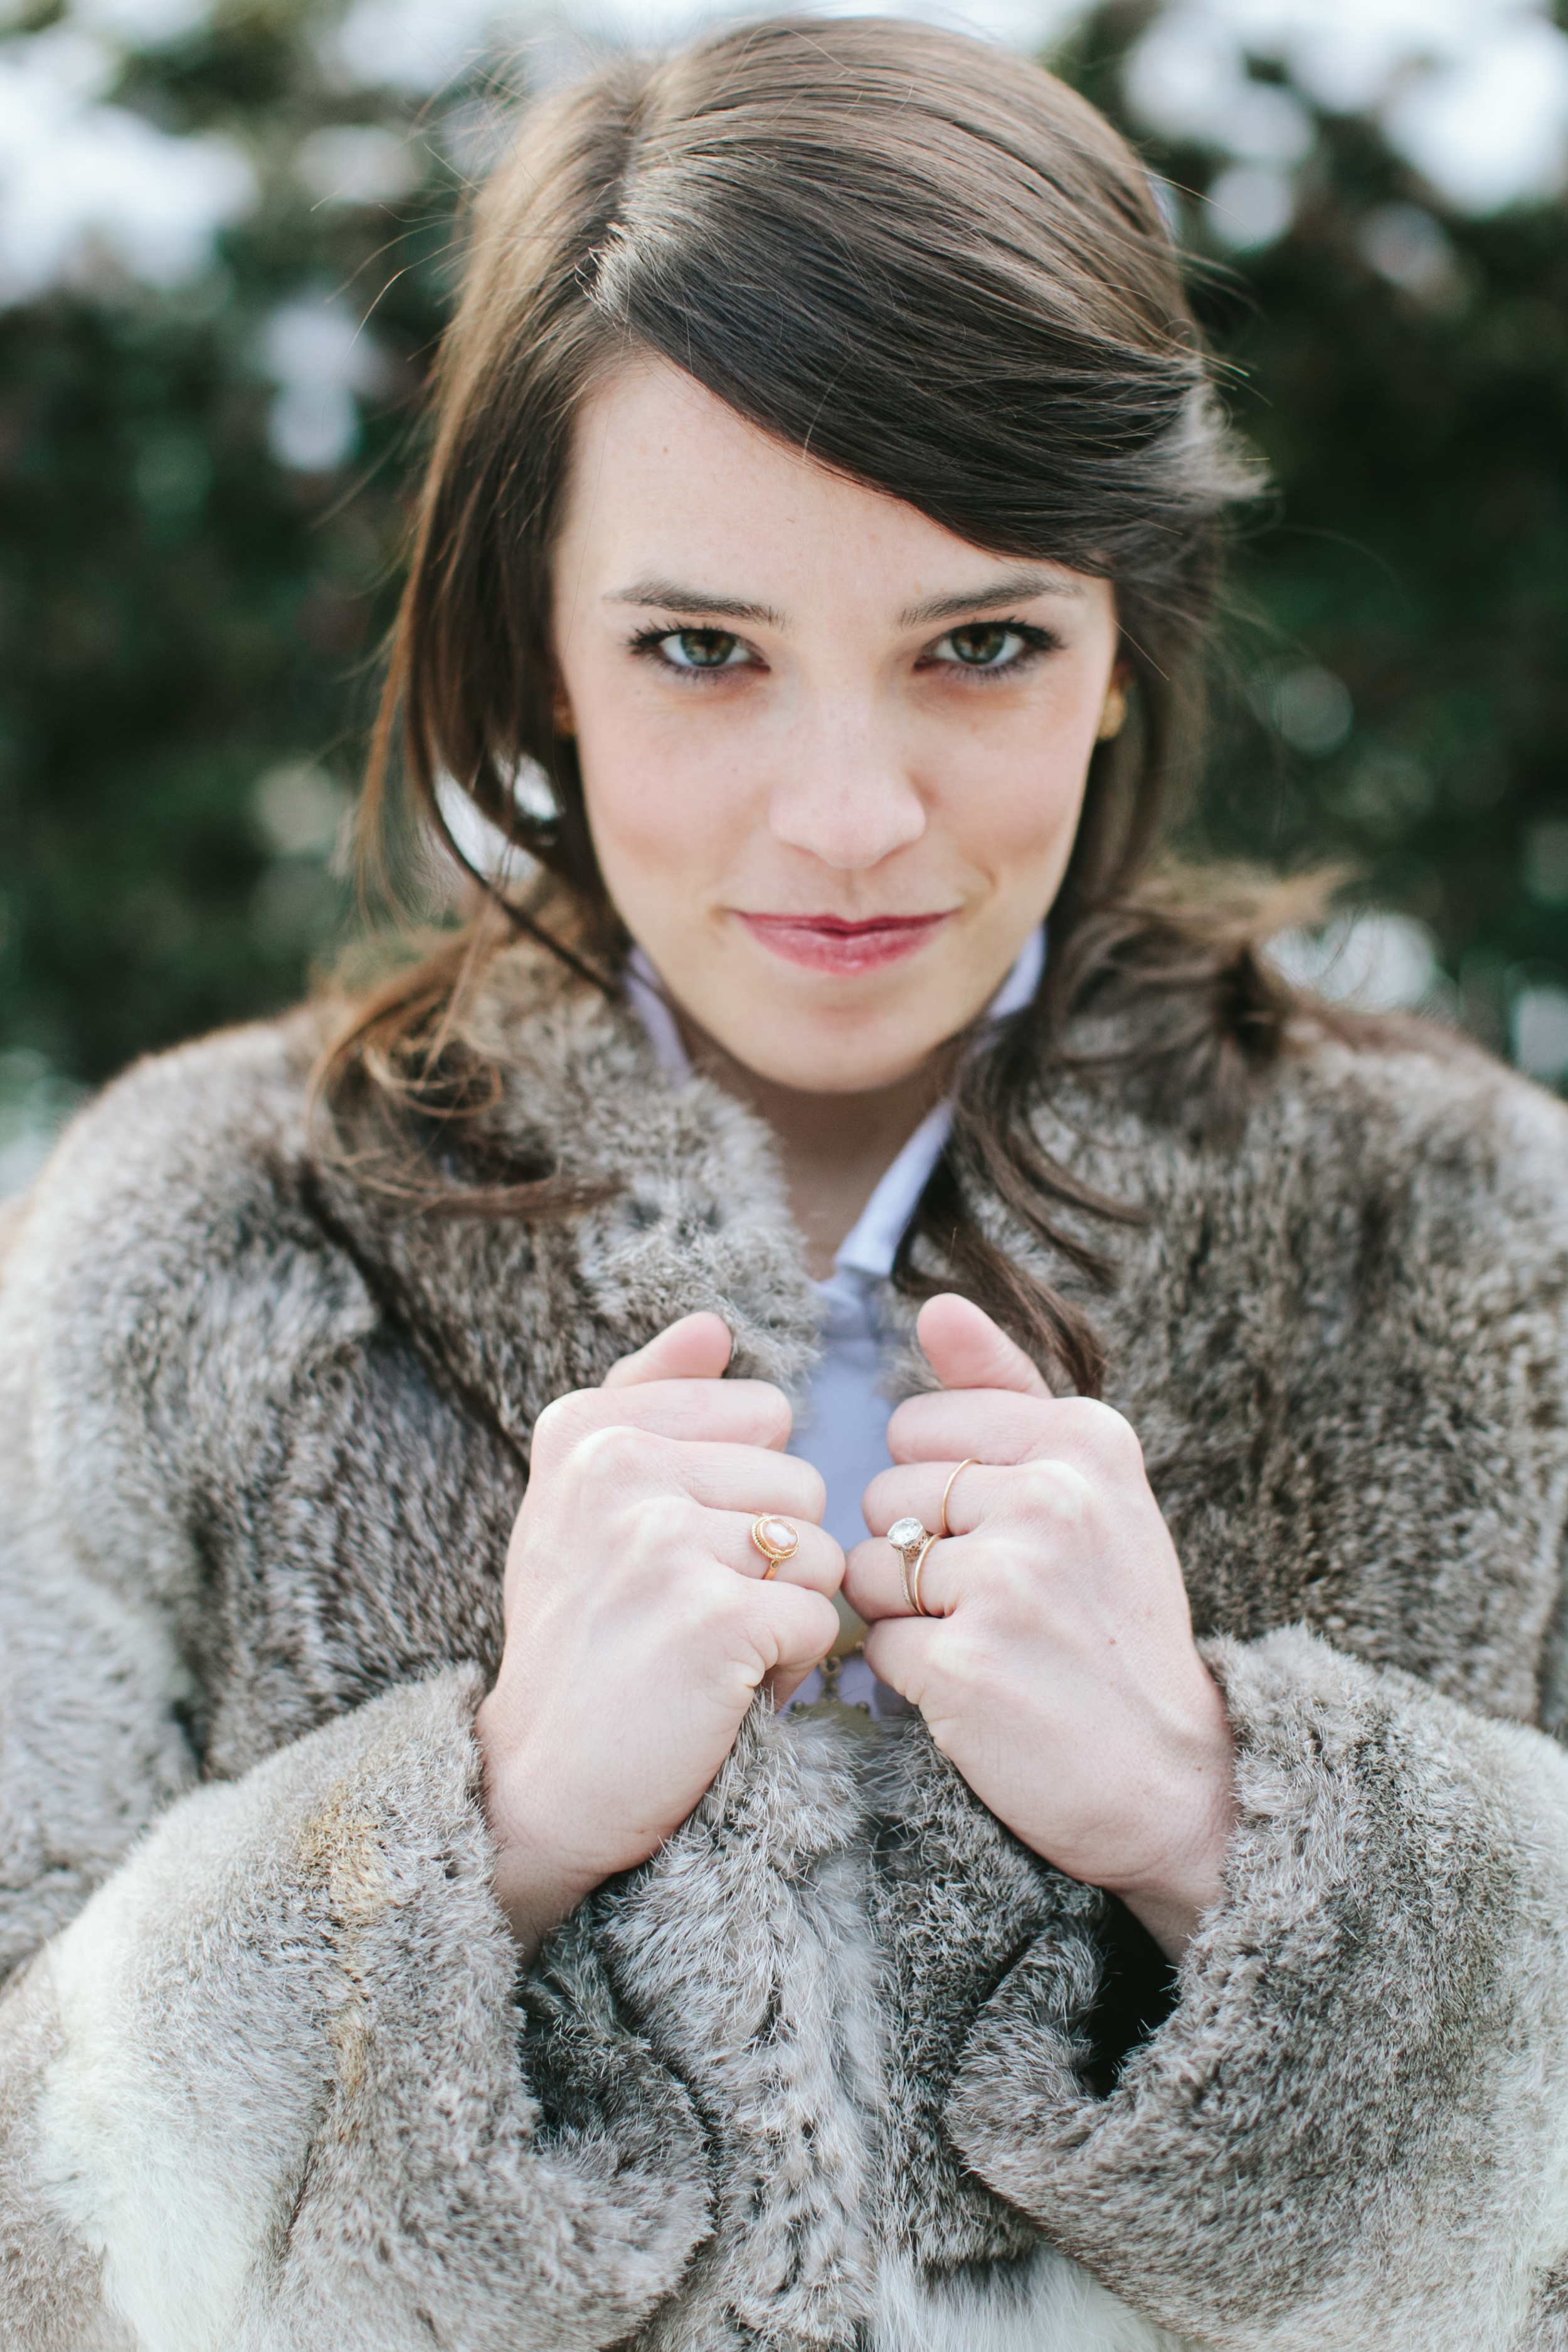 Atlanta-Fashion-Photographer-Kathryn-McCrary-Photography-Snow-Snowlanta-Fur-Coat-1.jpg